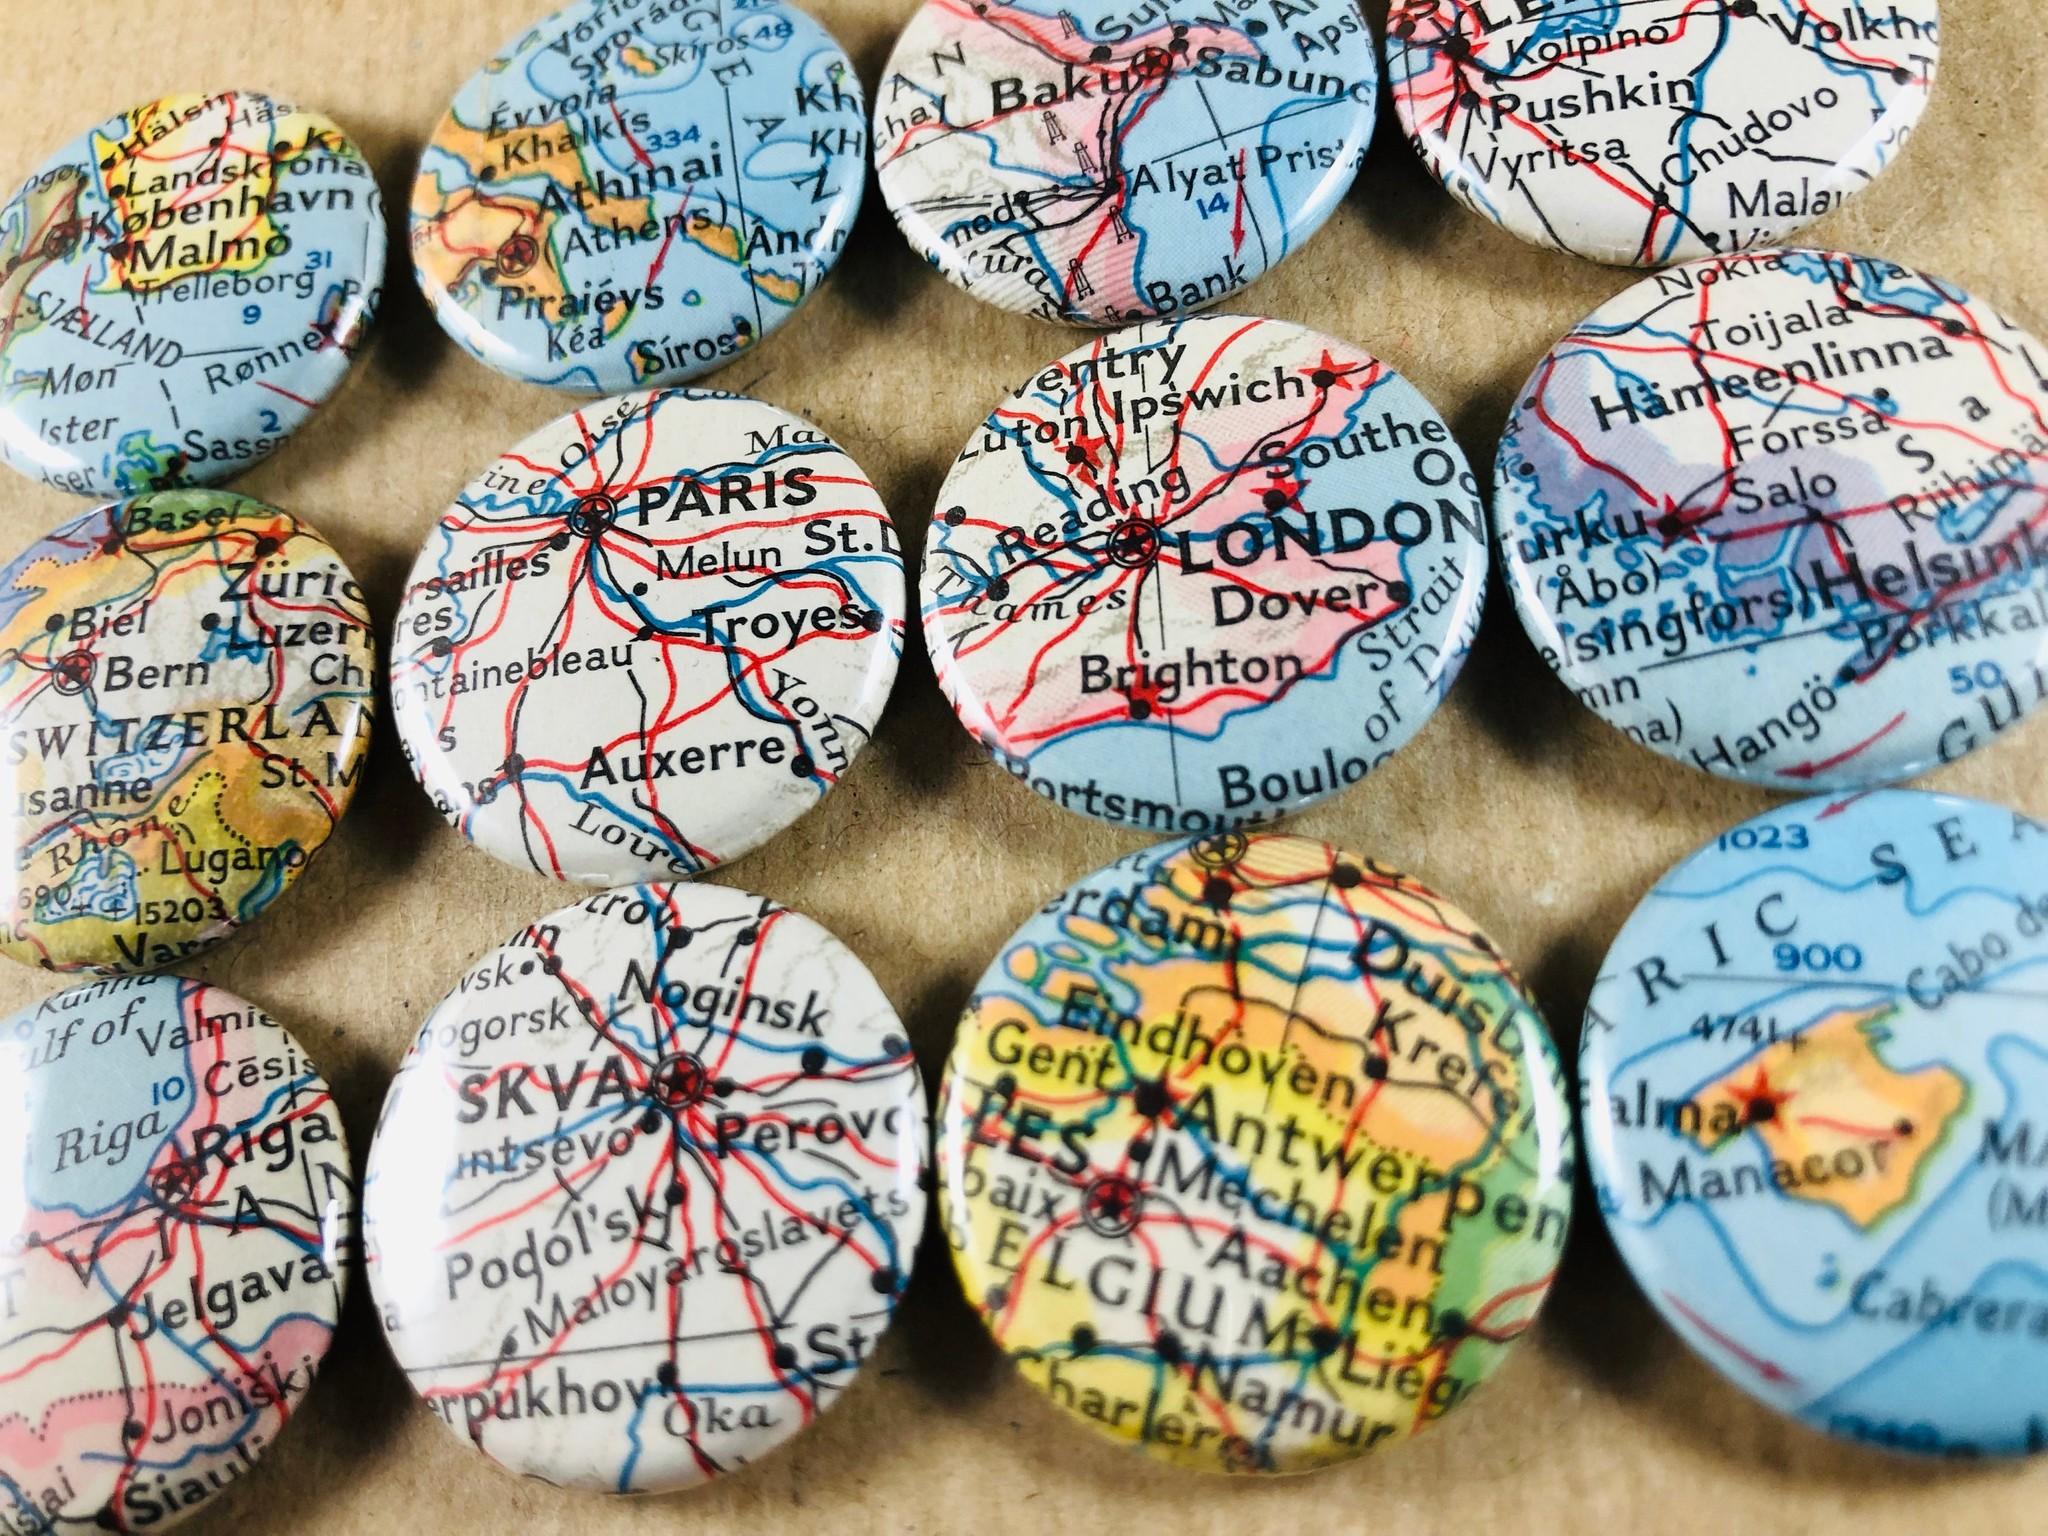 Kobenhavn, Athens, Baku, Pushkin, Paris, London, Helsinki, Riga, Antwerpen, magnet buttons